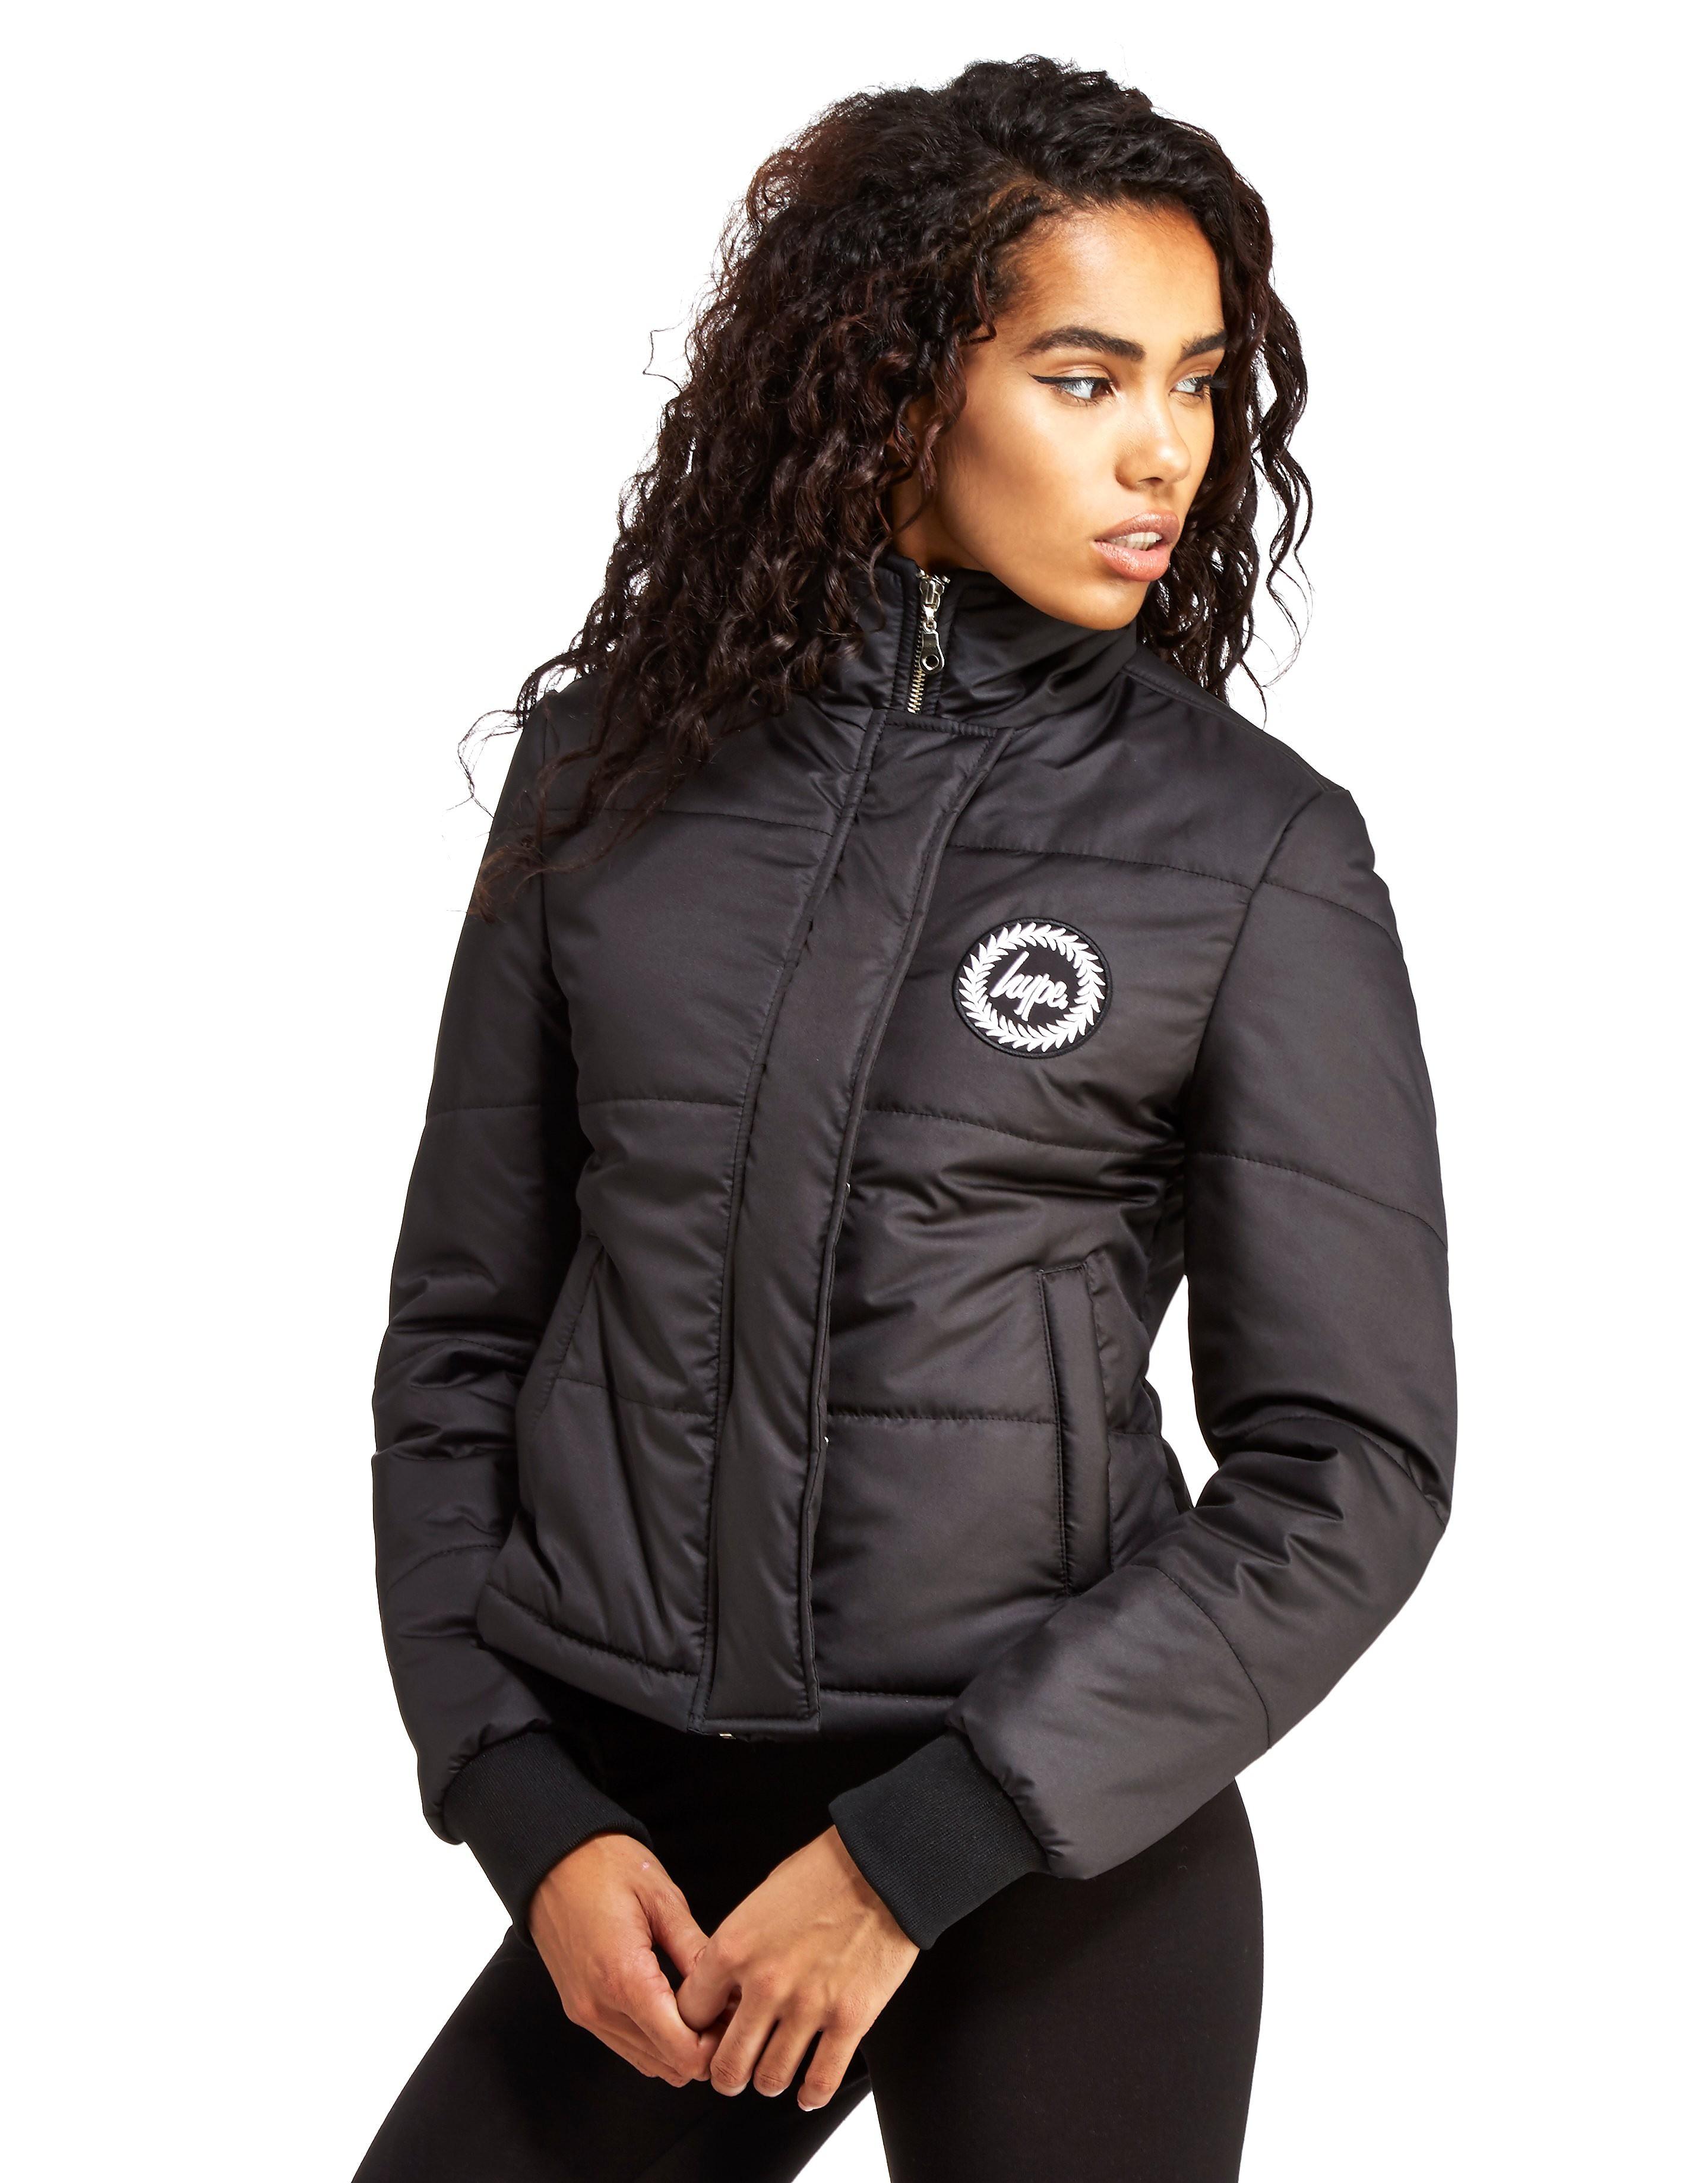 Hype Crop Puffa Jacket